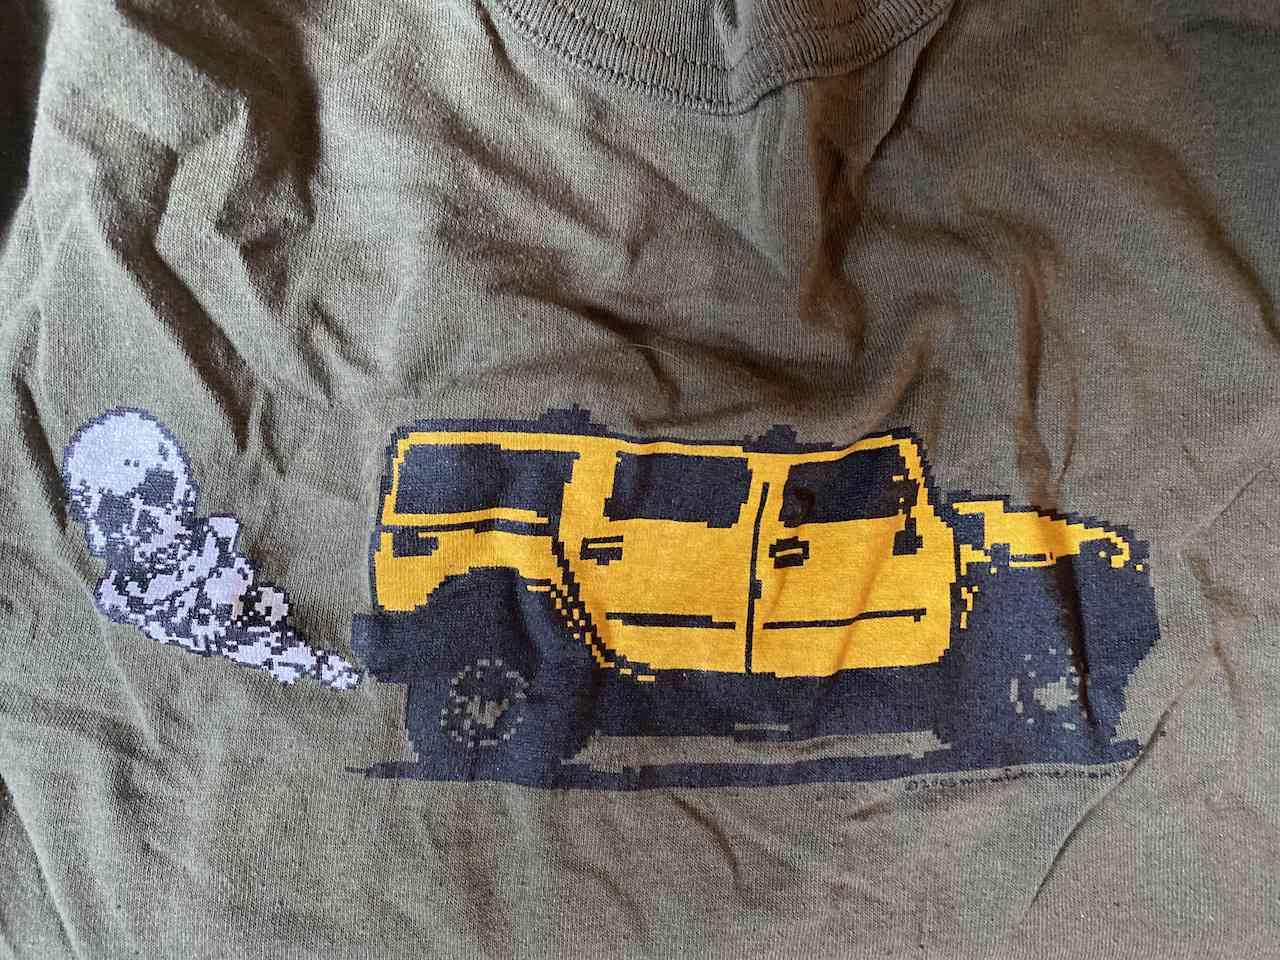 My old Hummer T-shirt